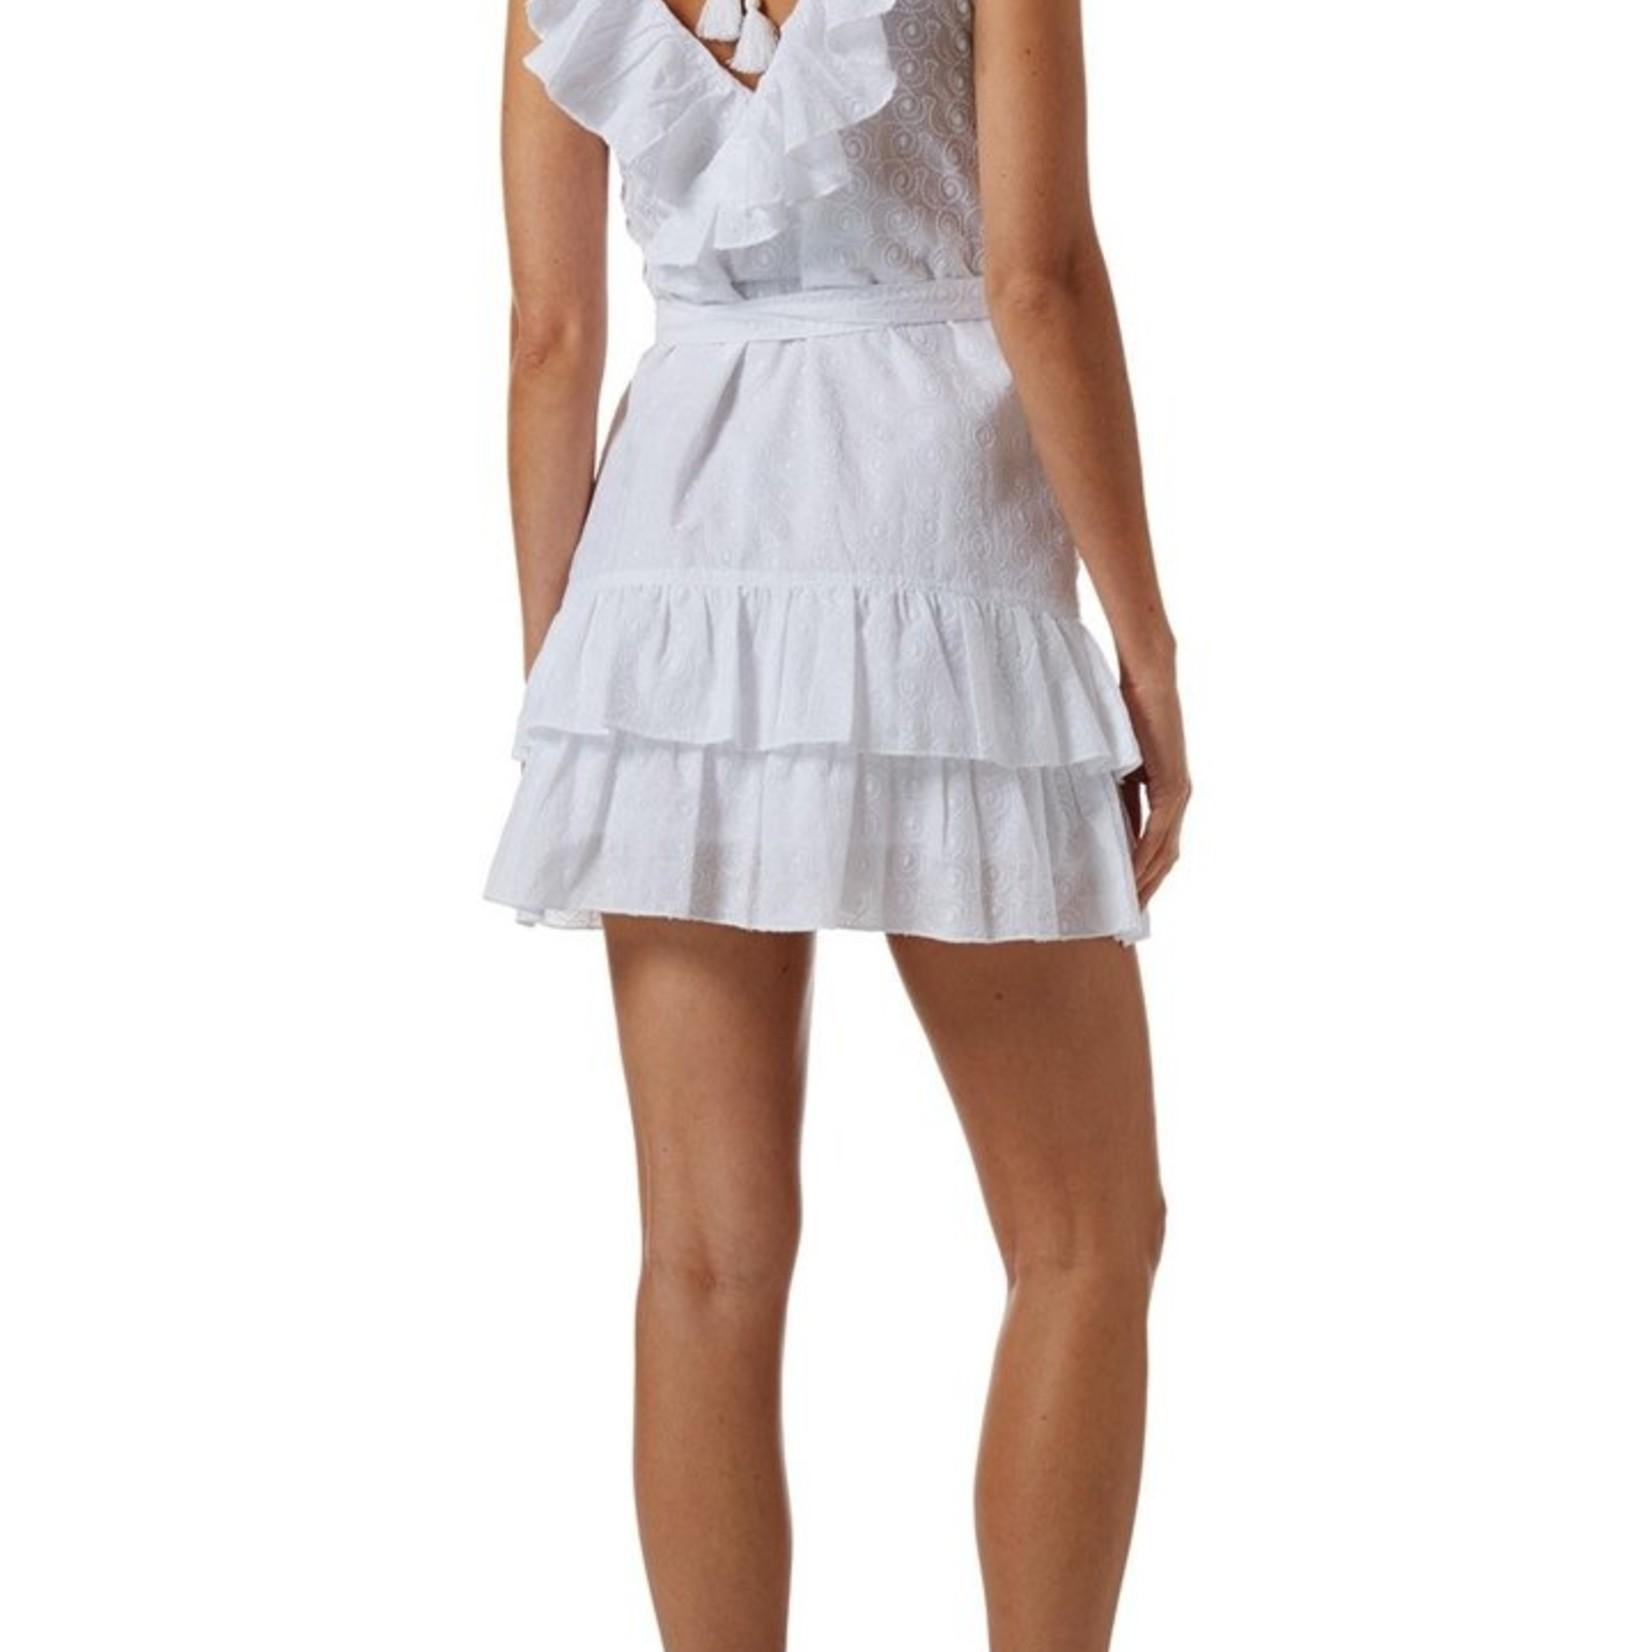 Melissa Odabash Melissa Odabash Molly Dress